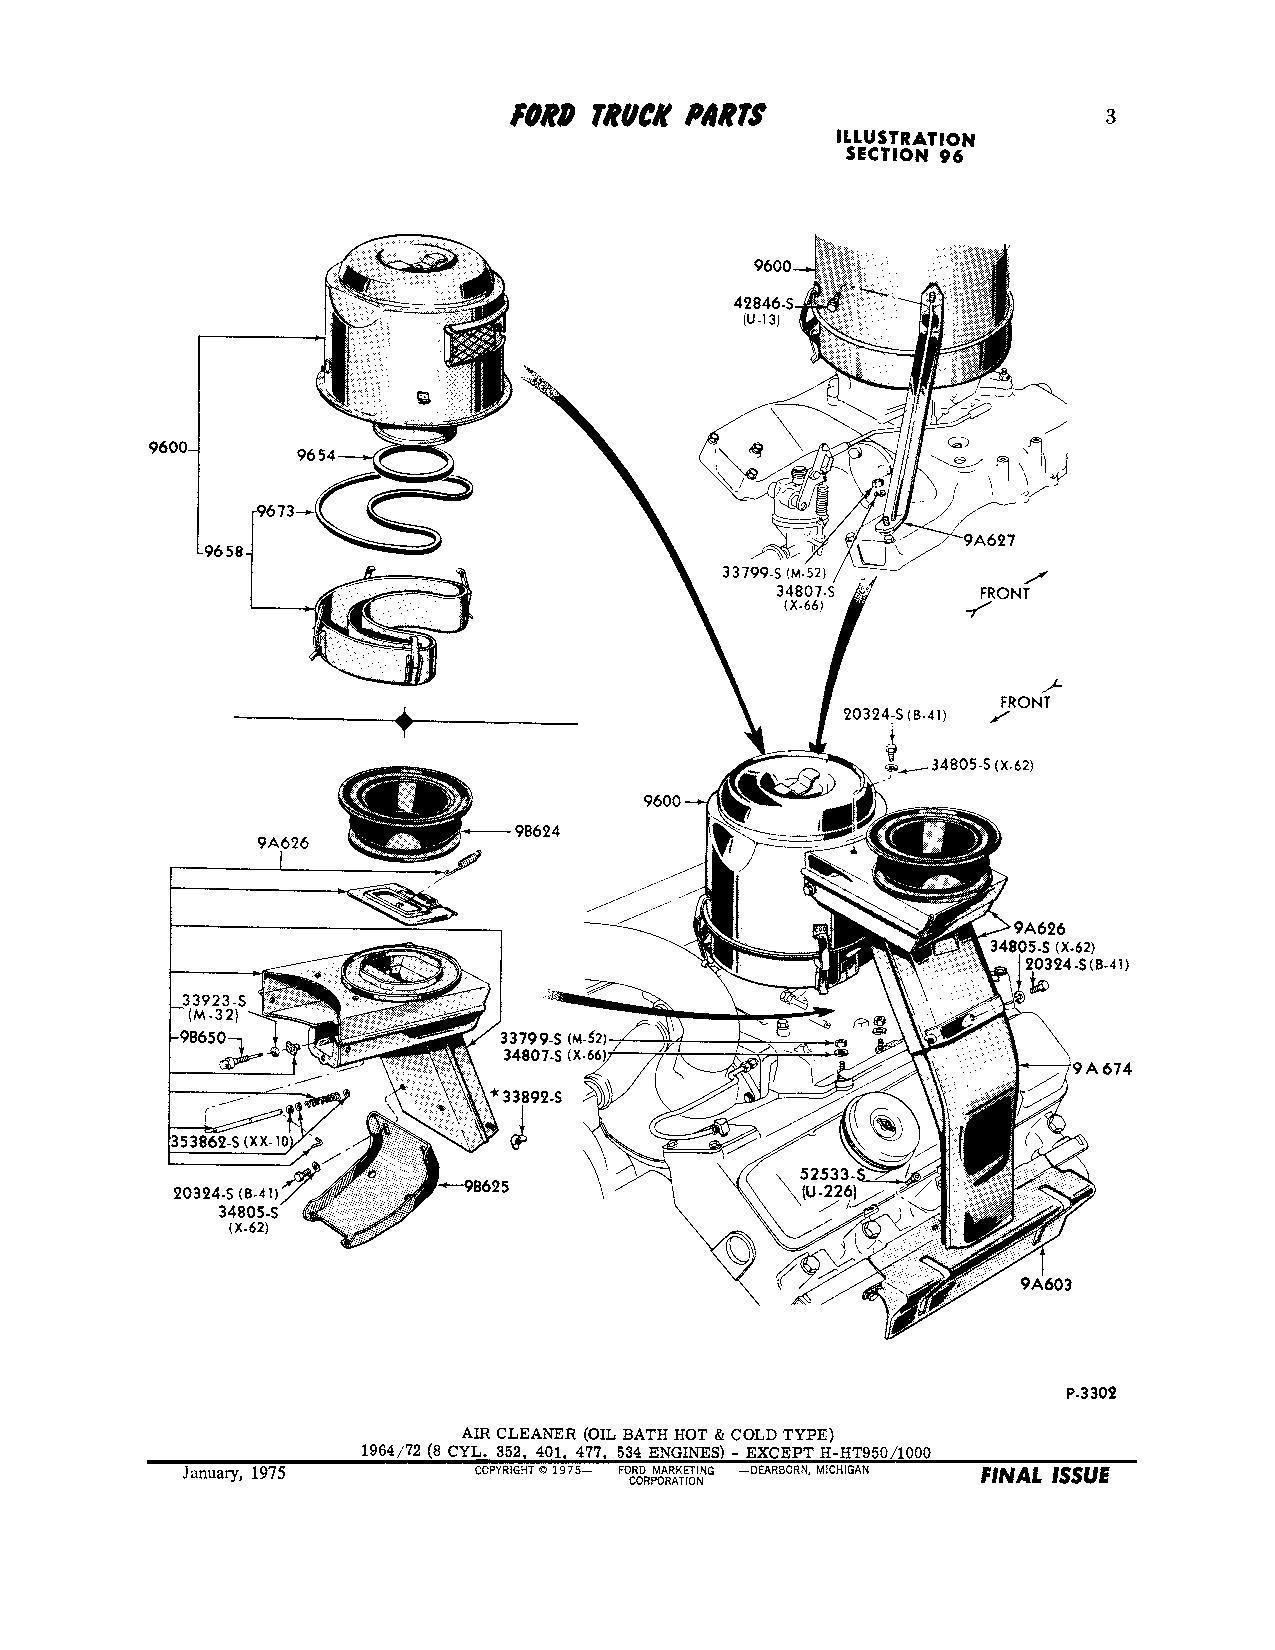 1961 ford dump truck